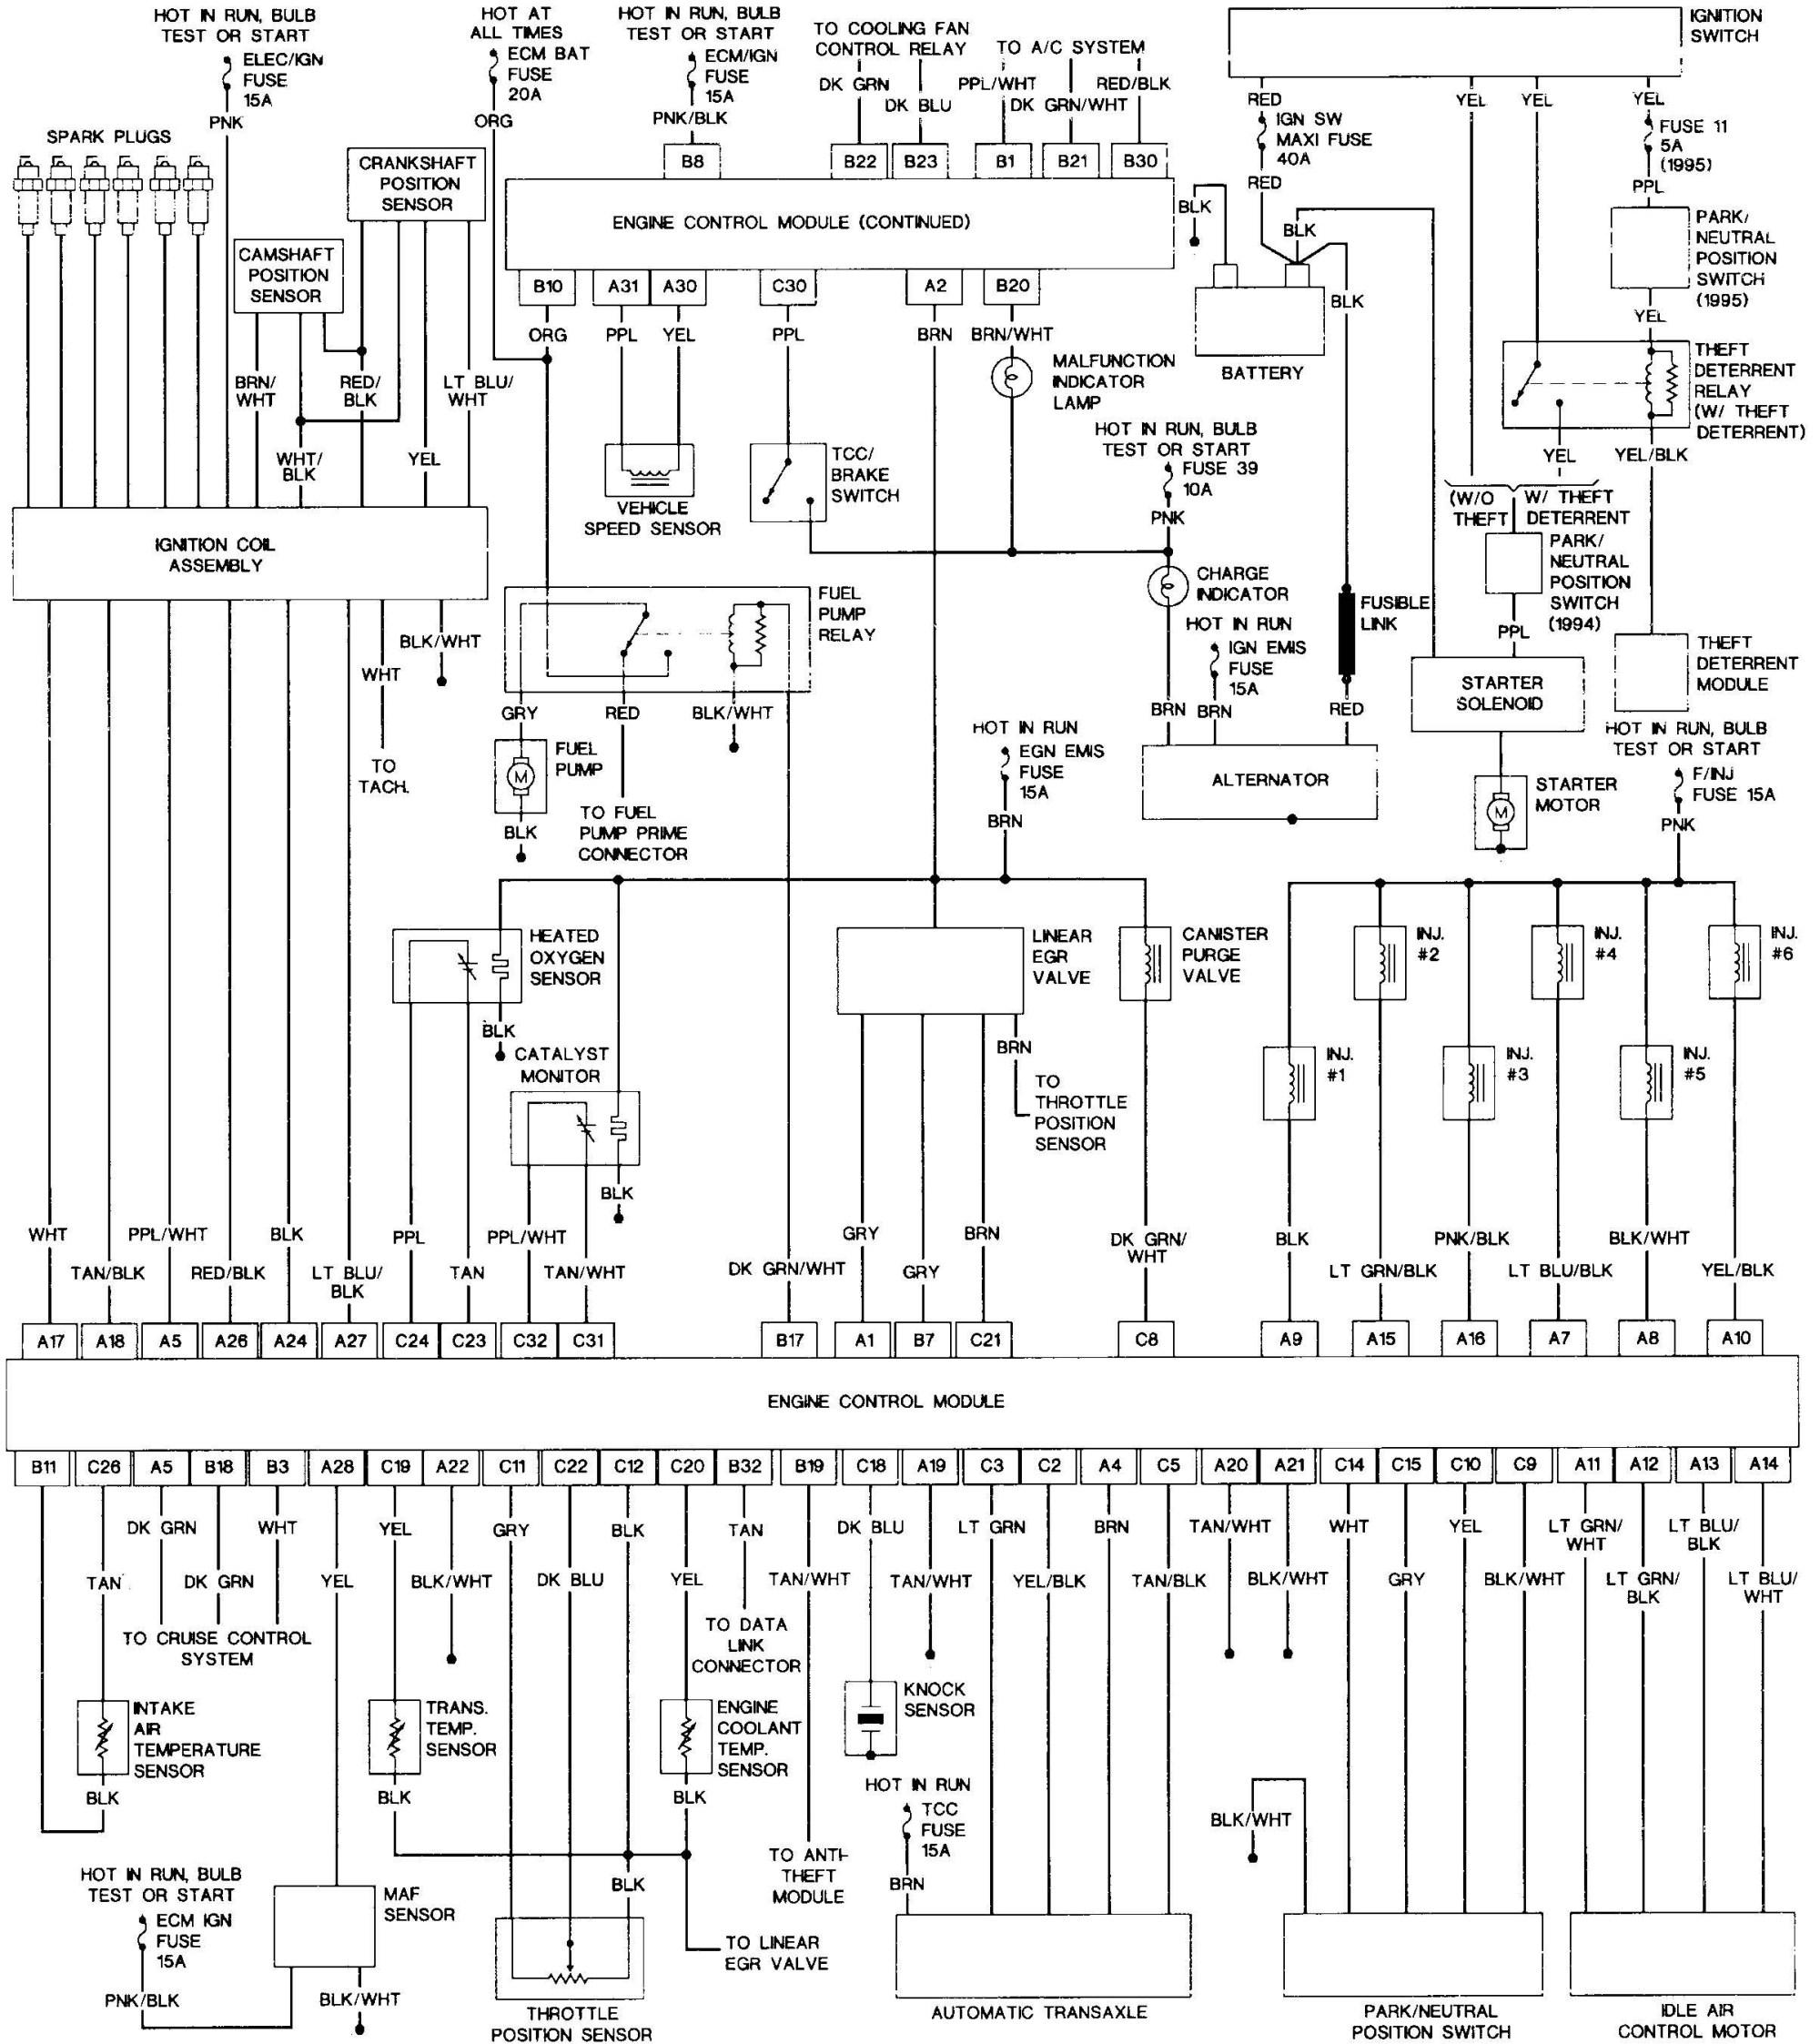 hight resolution of 2000 buick lesabre engine diagram 2003 buick lesabre radio wiring diagram shahsramblings of 2000 buick lesabre